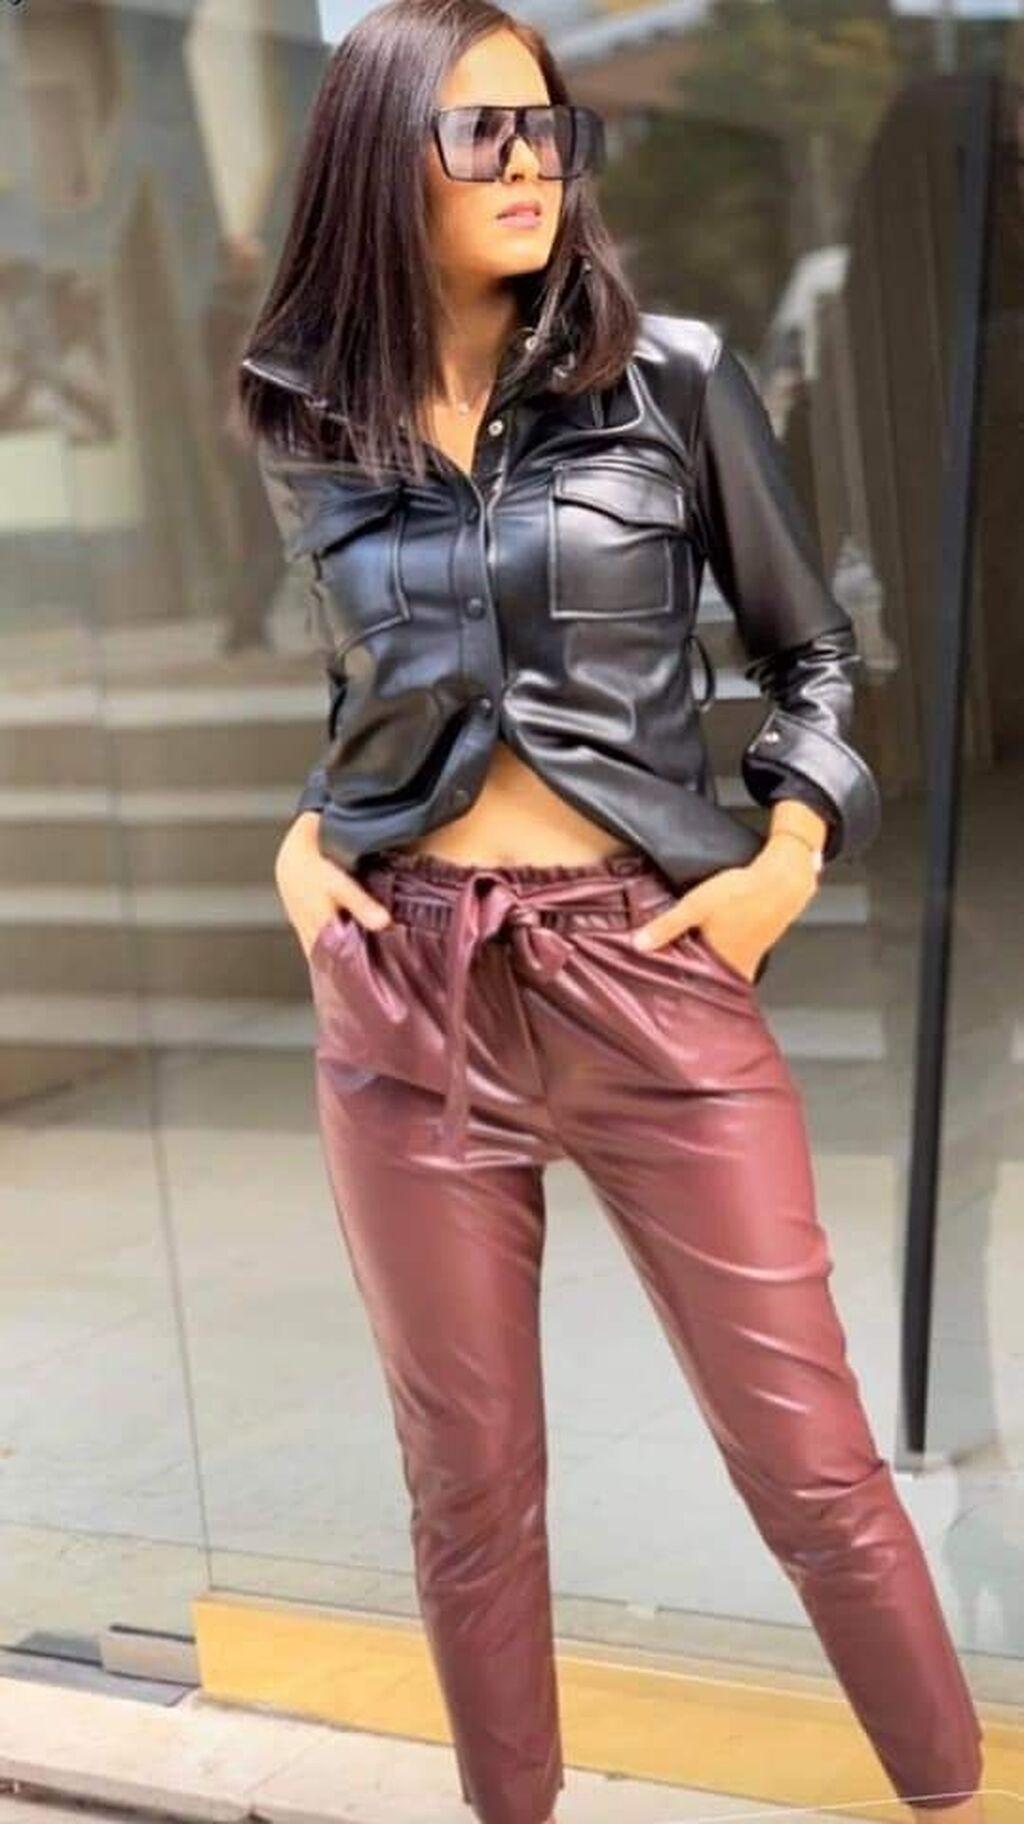 Suknje - Sremska Mitrovica: Suknje 1650 din S M L XL Pantalone 1800 din S M L XL